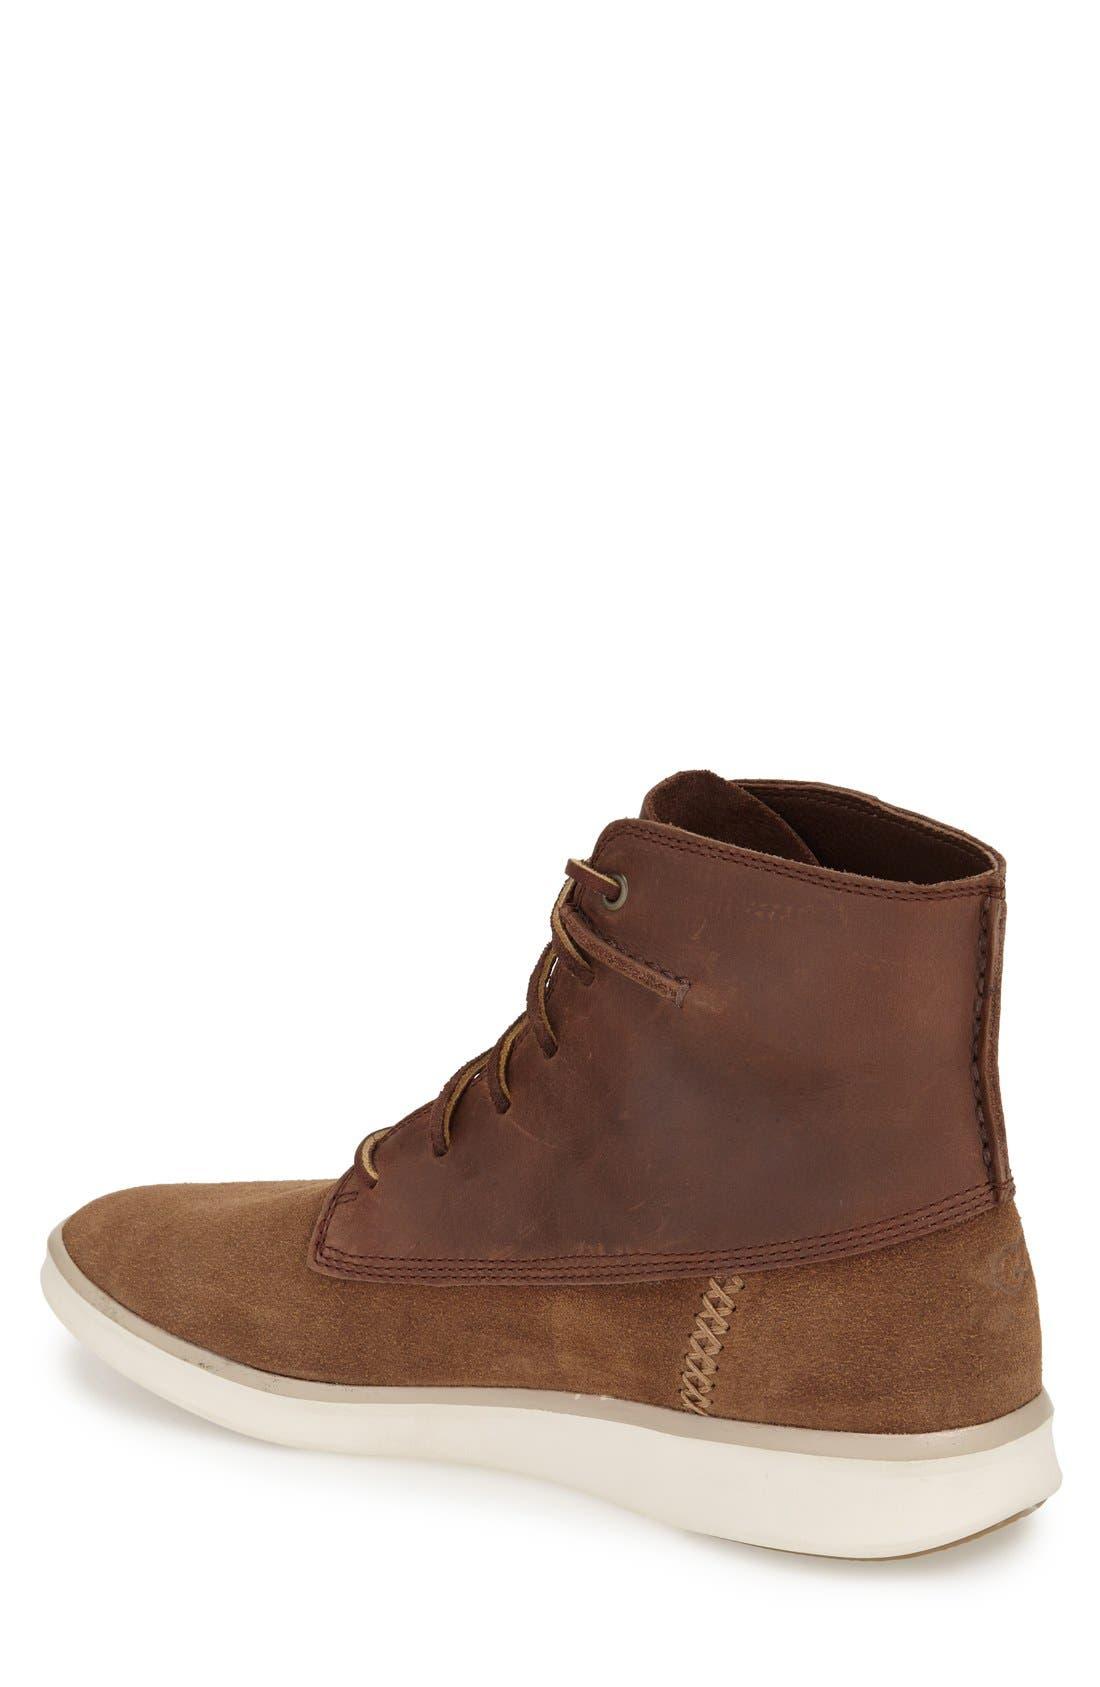 Alternate Image 2  - UGG® 'Lamont' High Top Sneaker (Men)